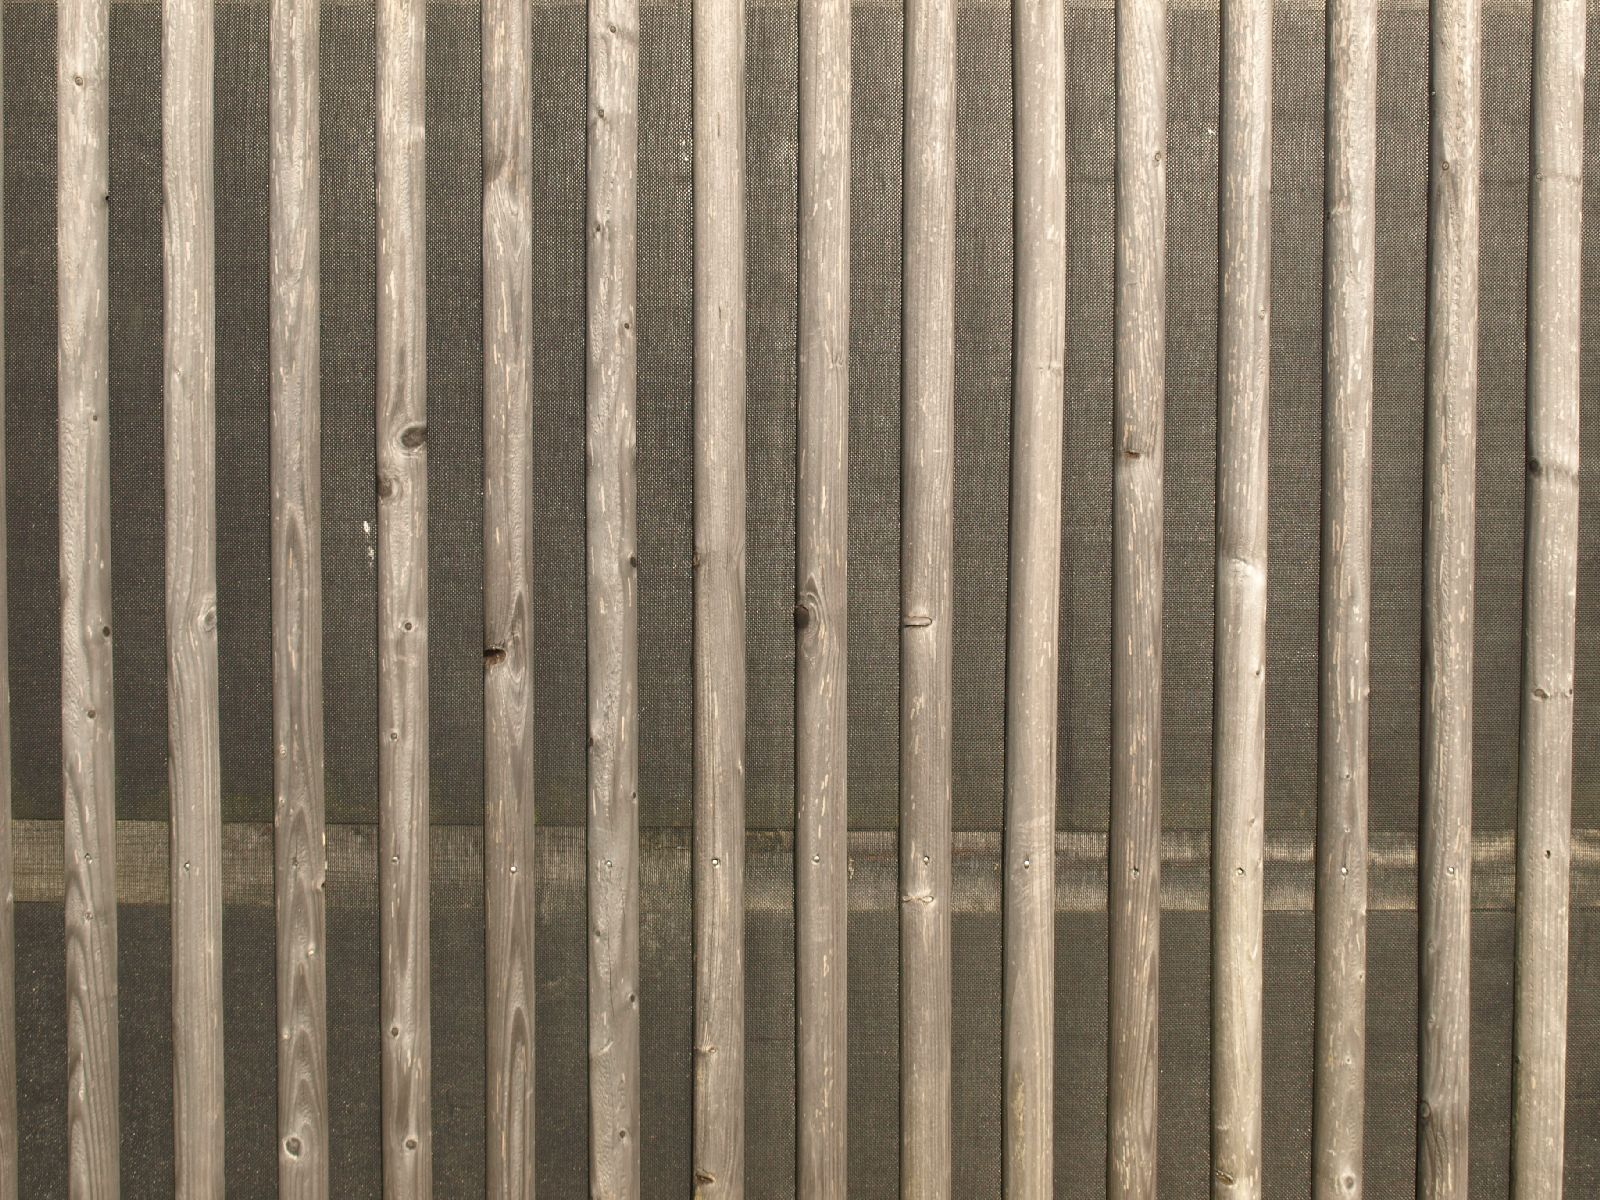 Wood_Texture_A_P9129646